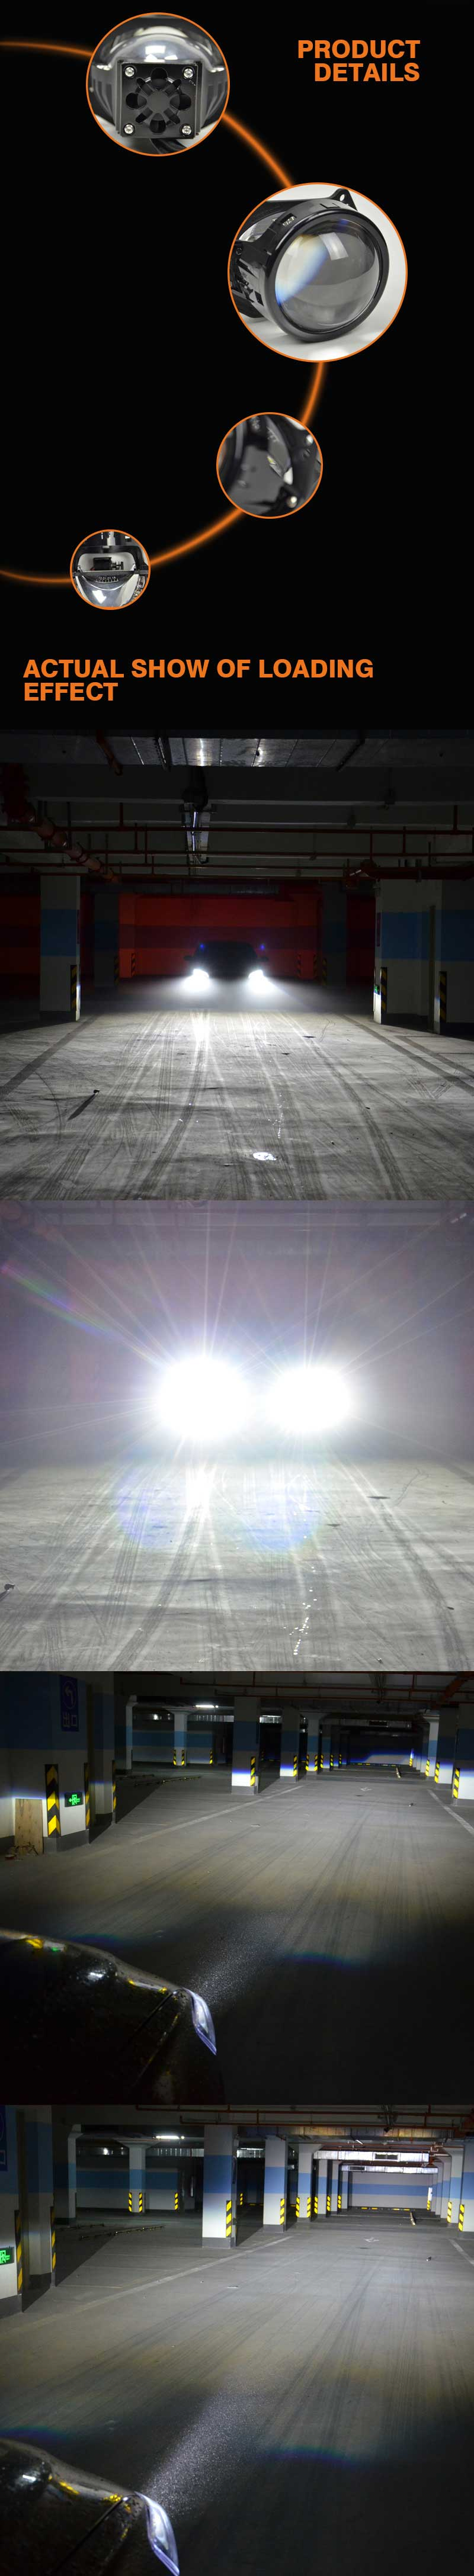 A4 3-Inch Bi-Led Projector Headlight